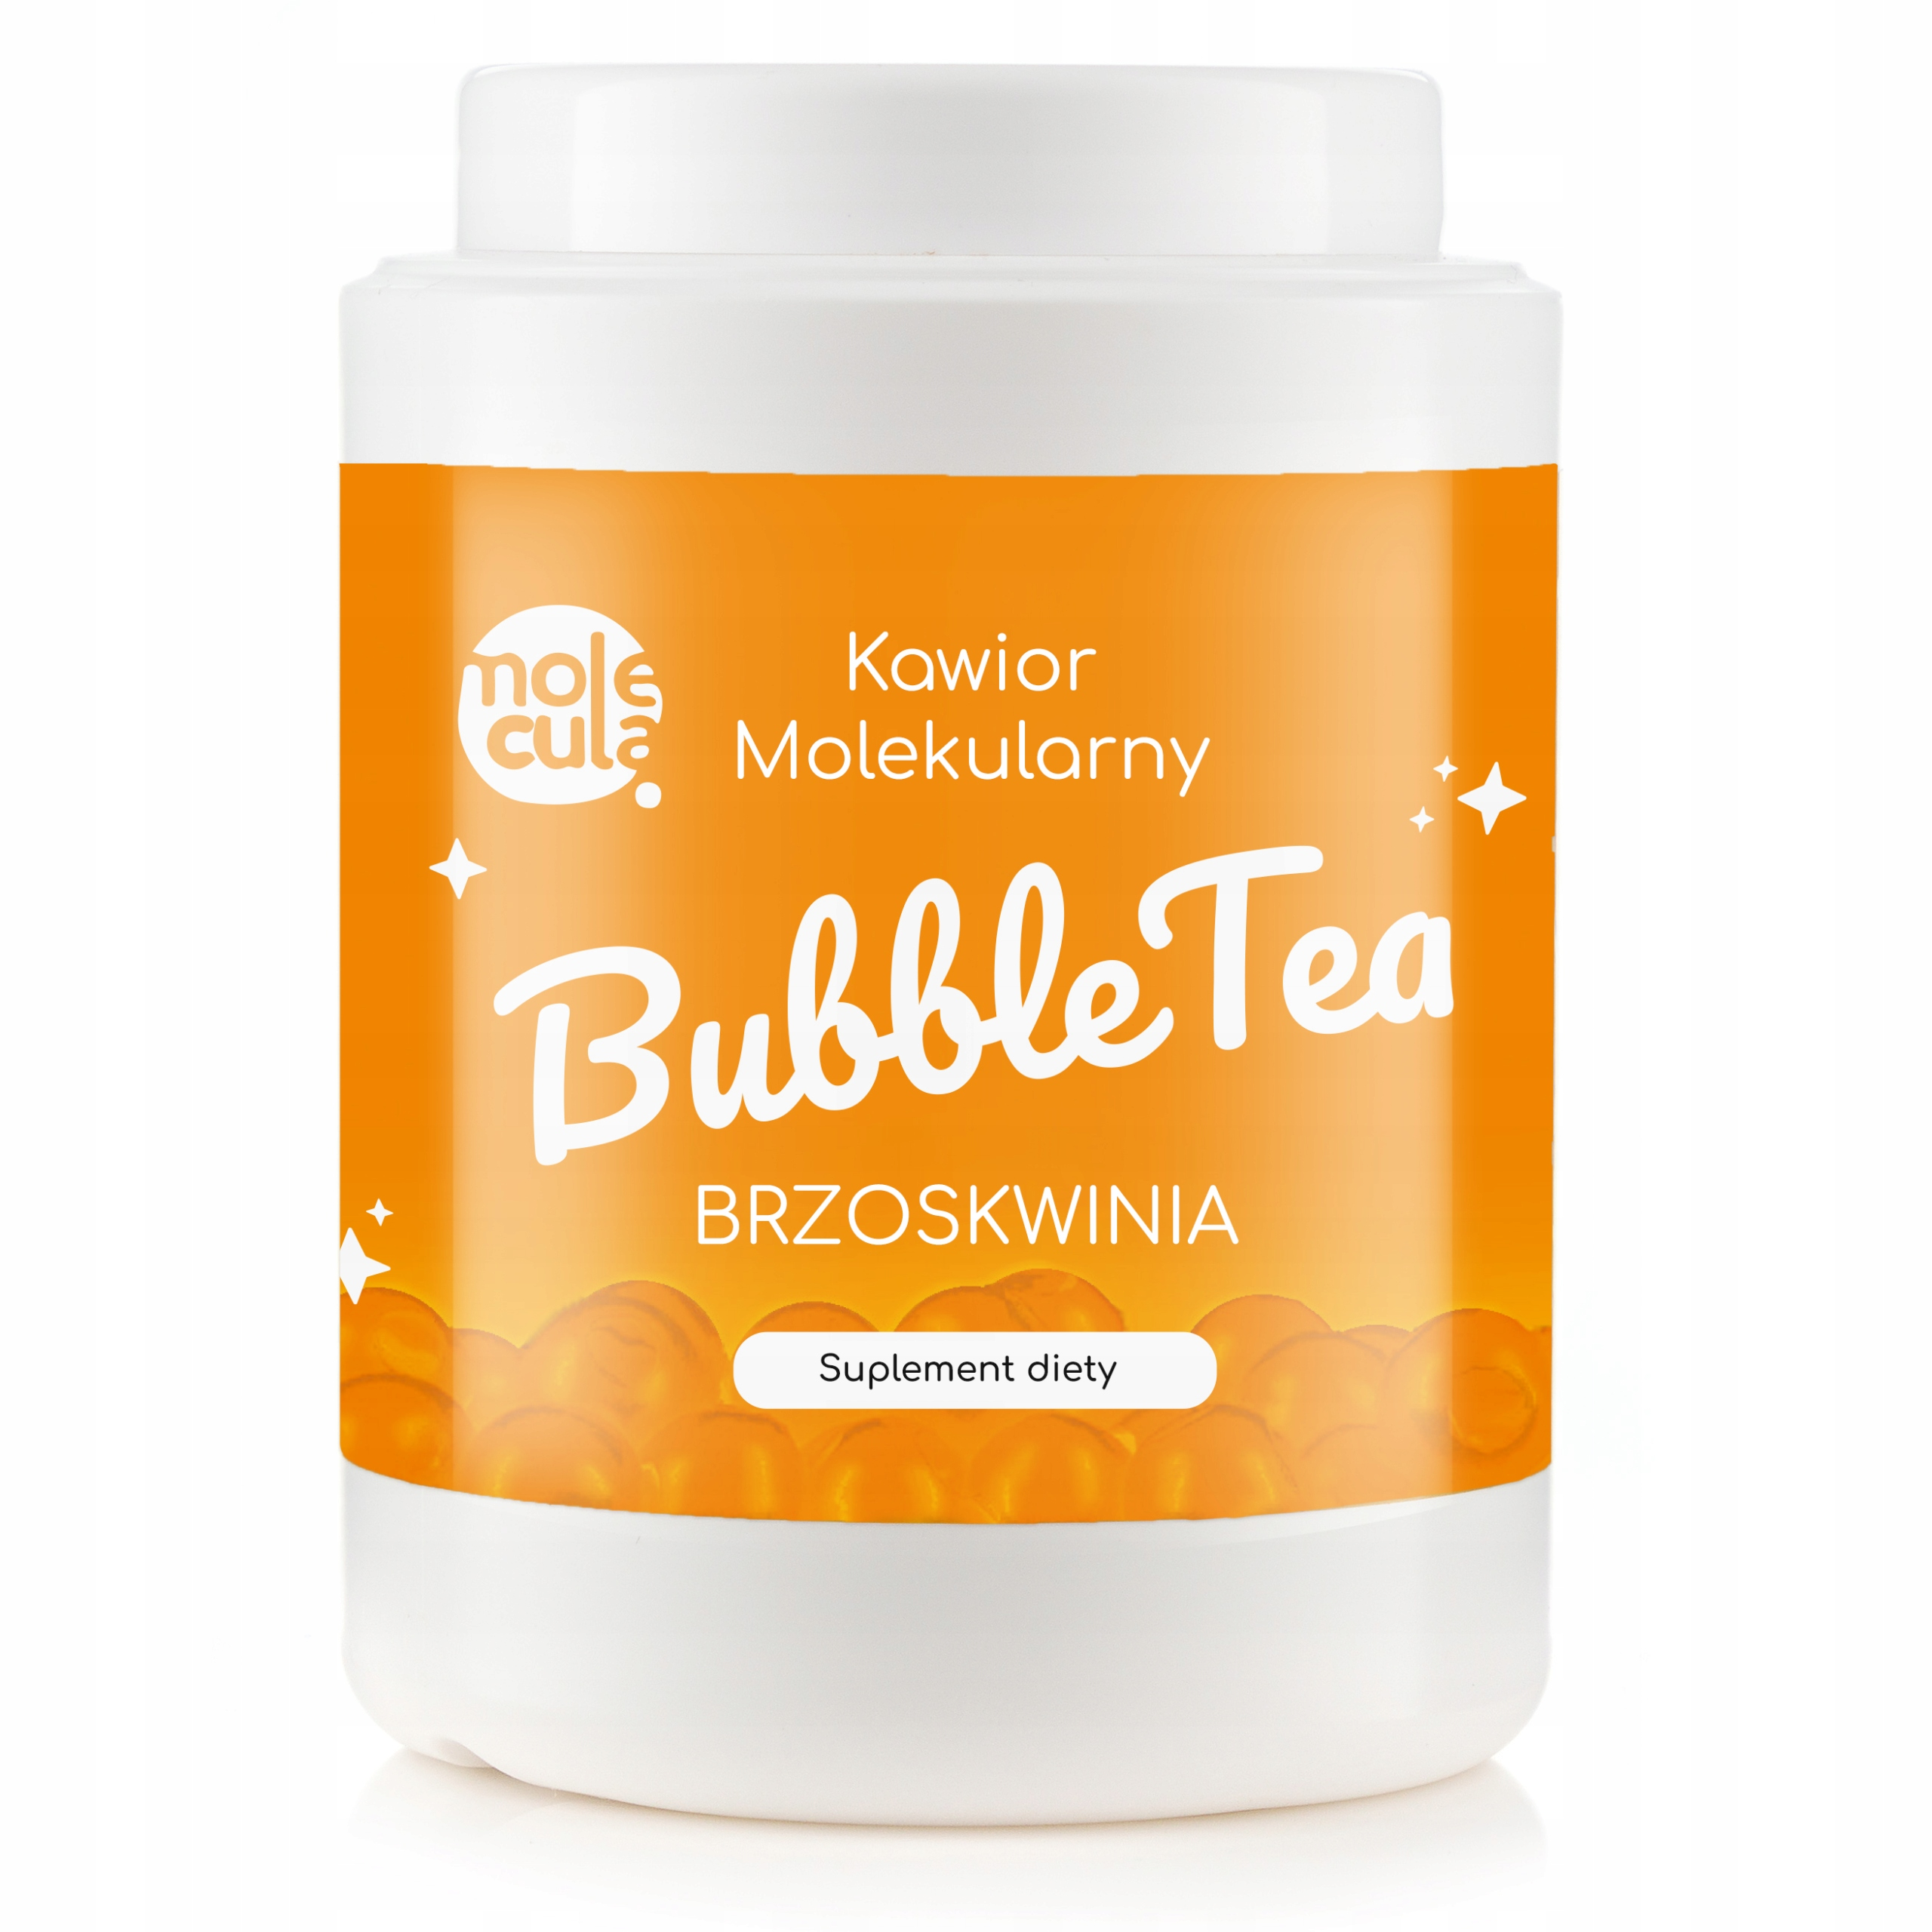 Чайные шарики Bubble Tea Balls Molecular Caviar 2KG PEACH